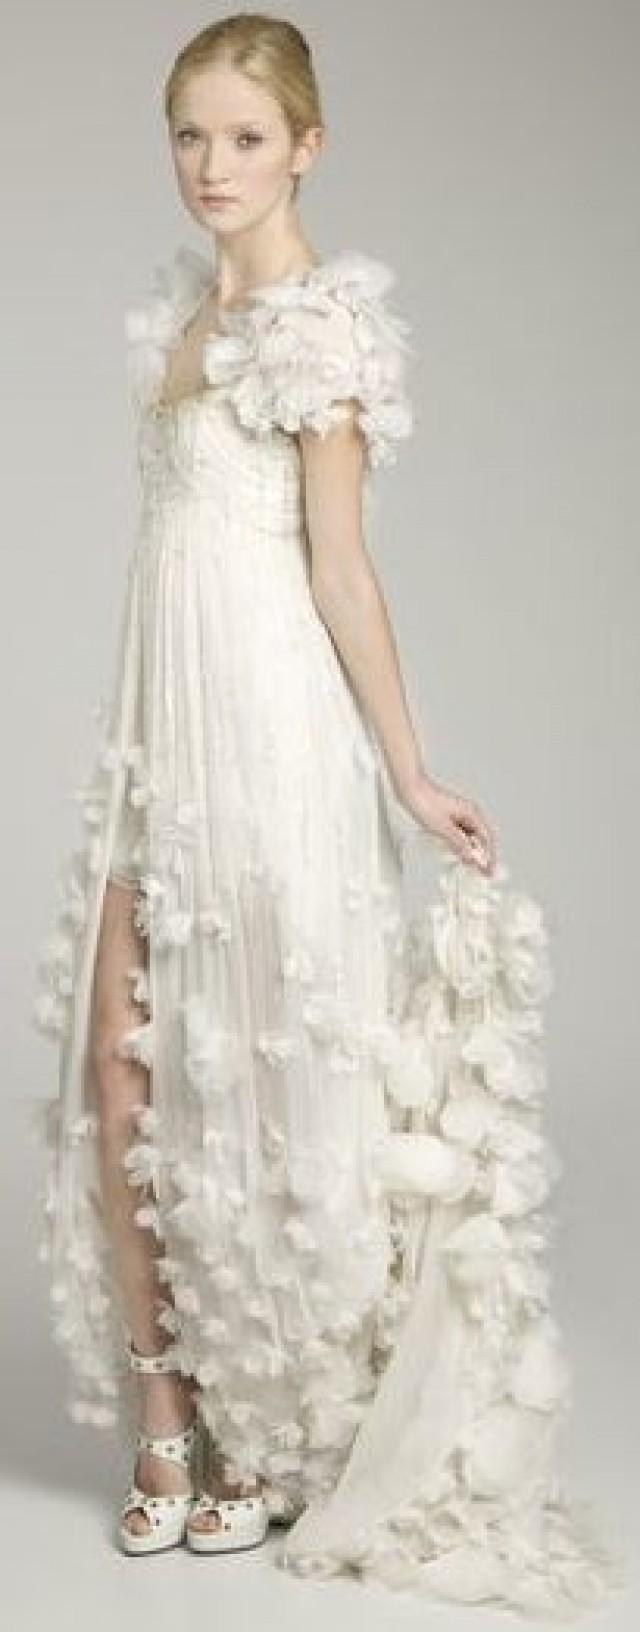 Fairy wedding bohemian wedding dress 2054029 weddbook junglespirit Image collections